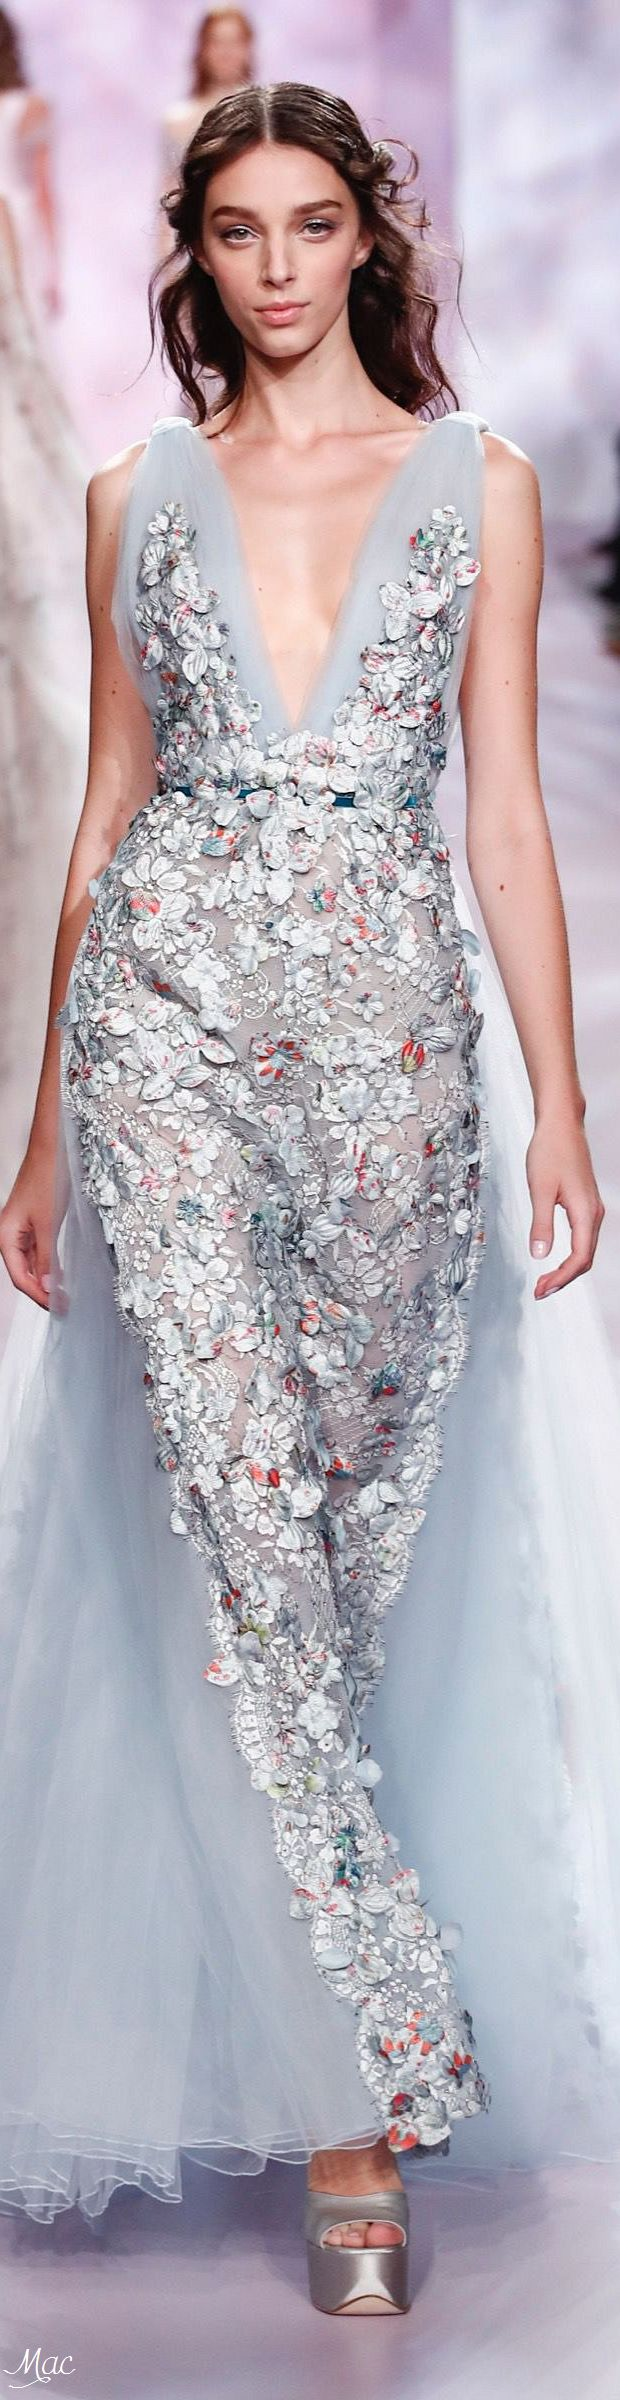 www.2locos.com  Spring 2017 Haute Couture Georges Chakra